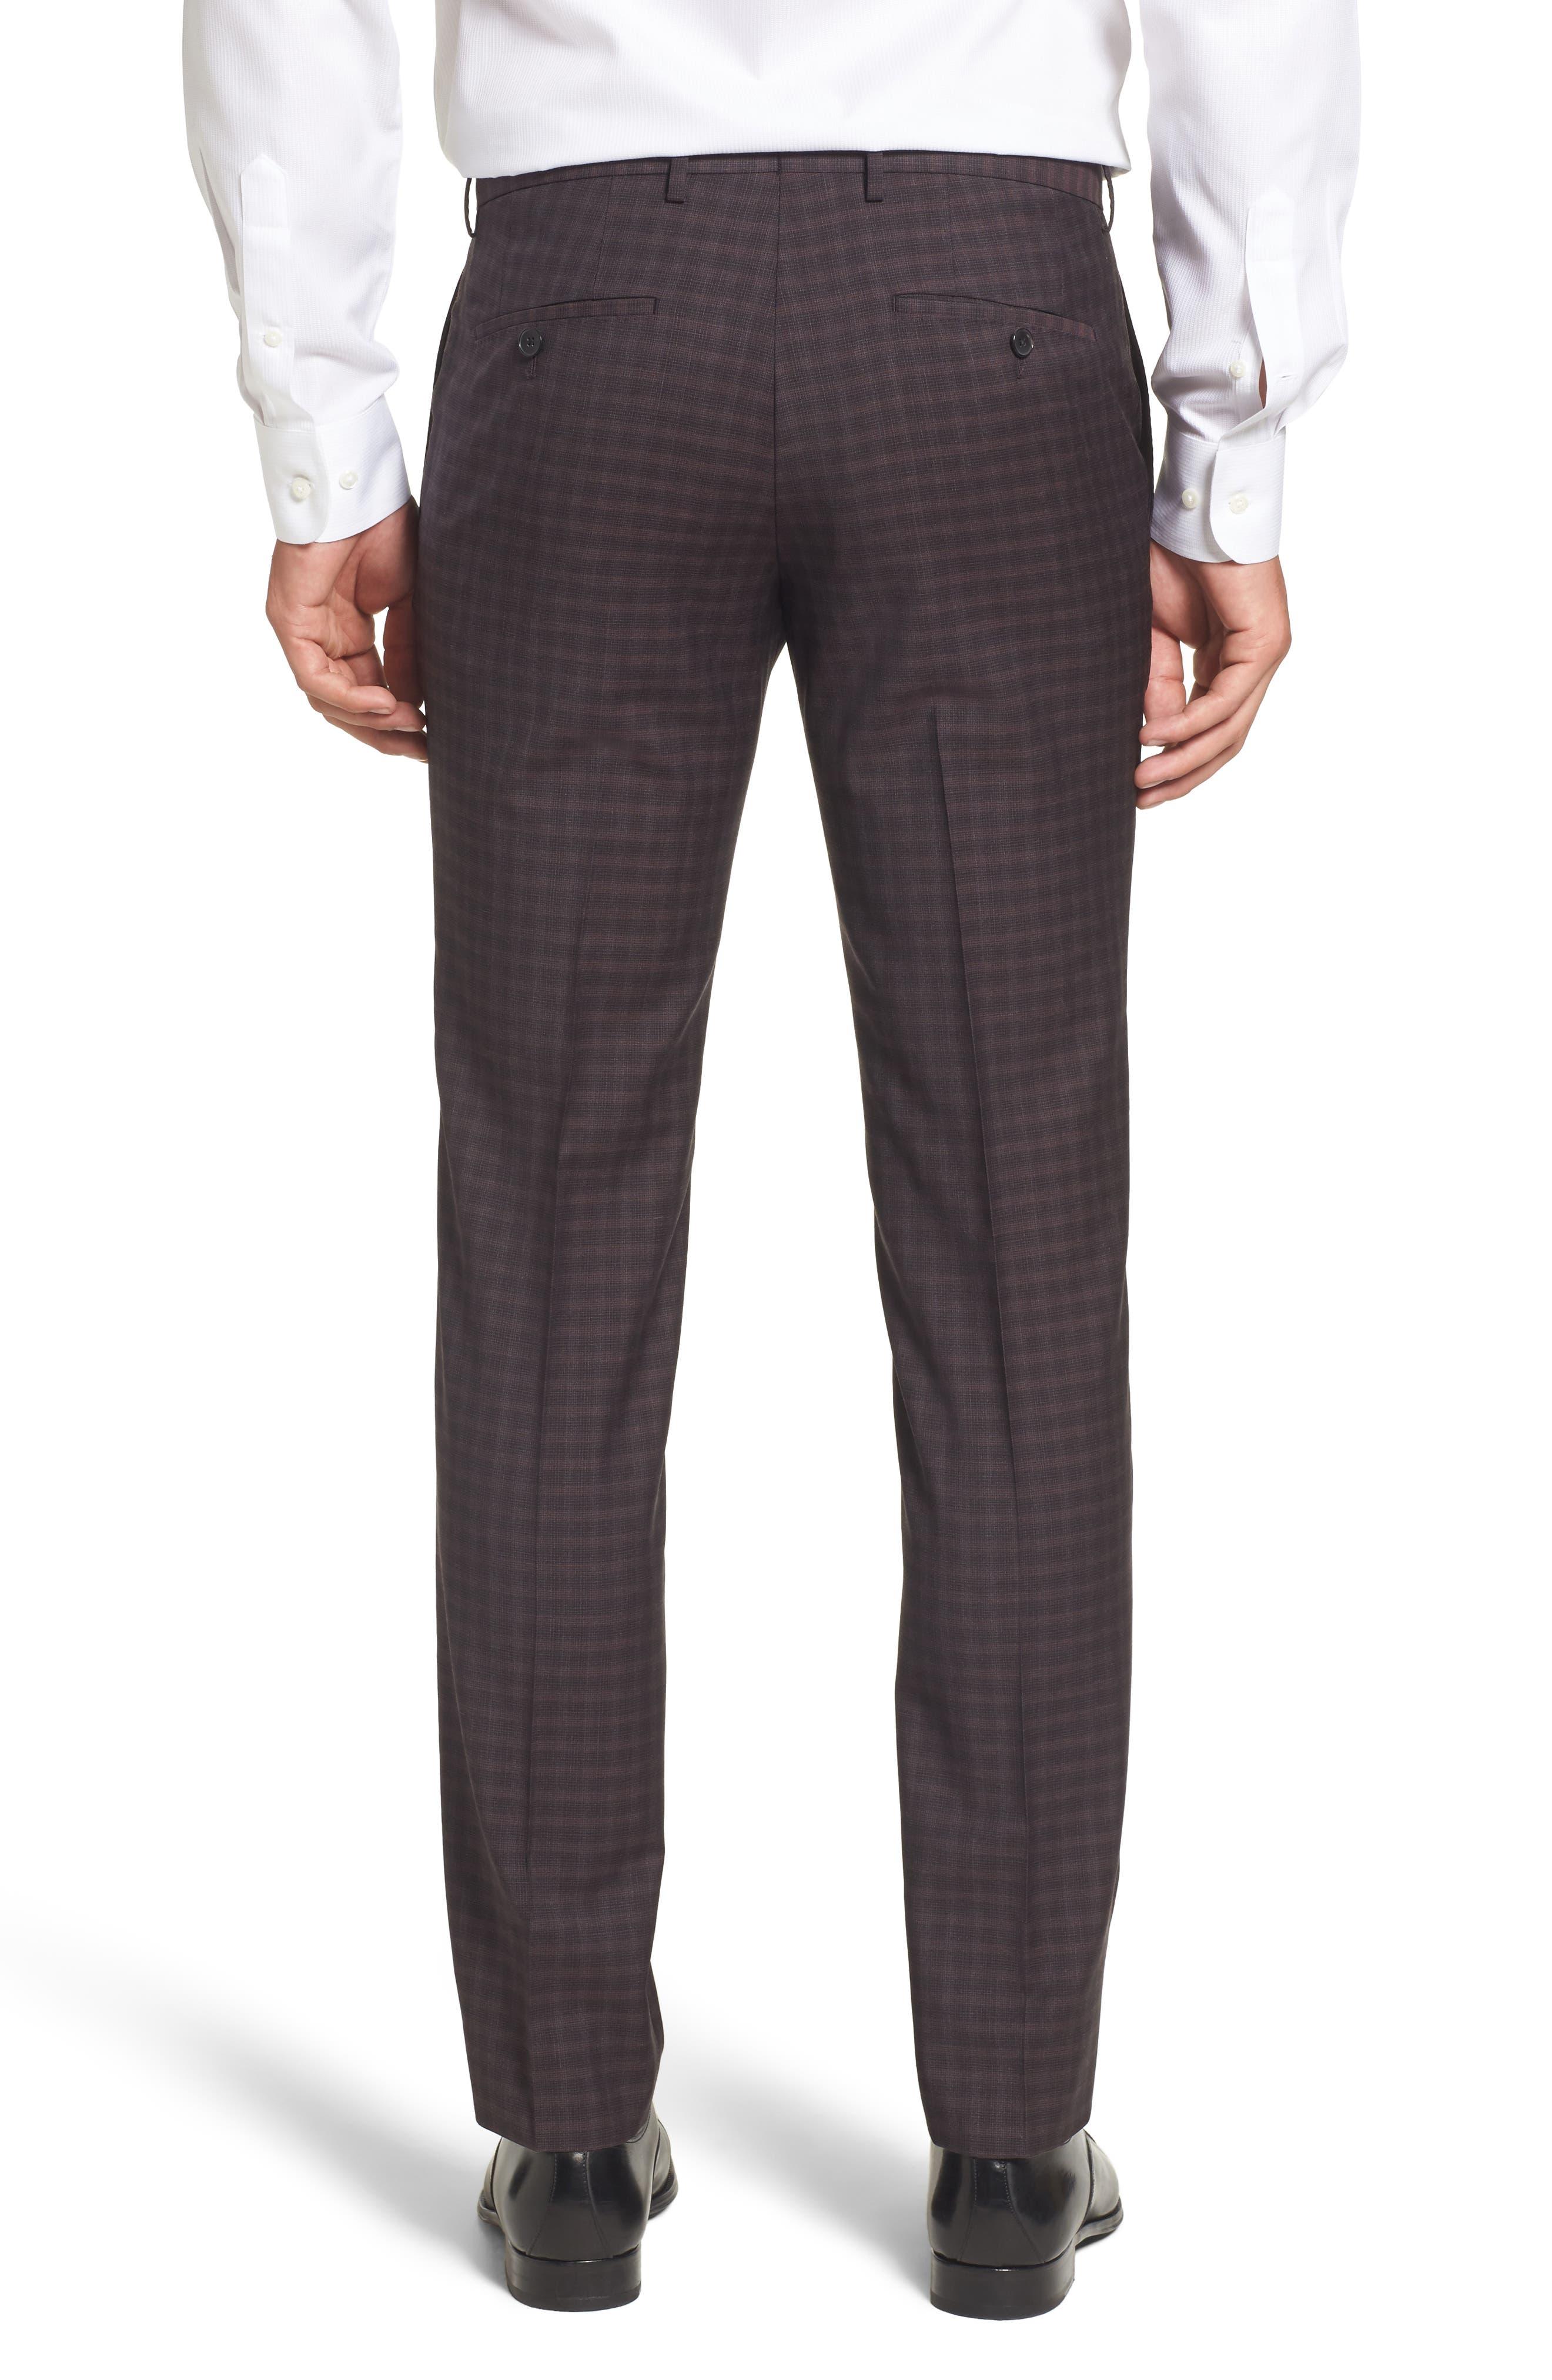 Benso Regular Fit Wool Trousers,                             Alternate thumbnail 2, color,                             Dark Red